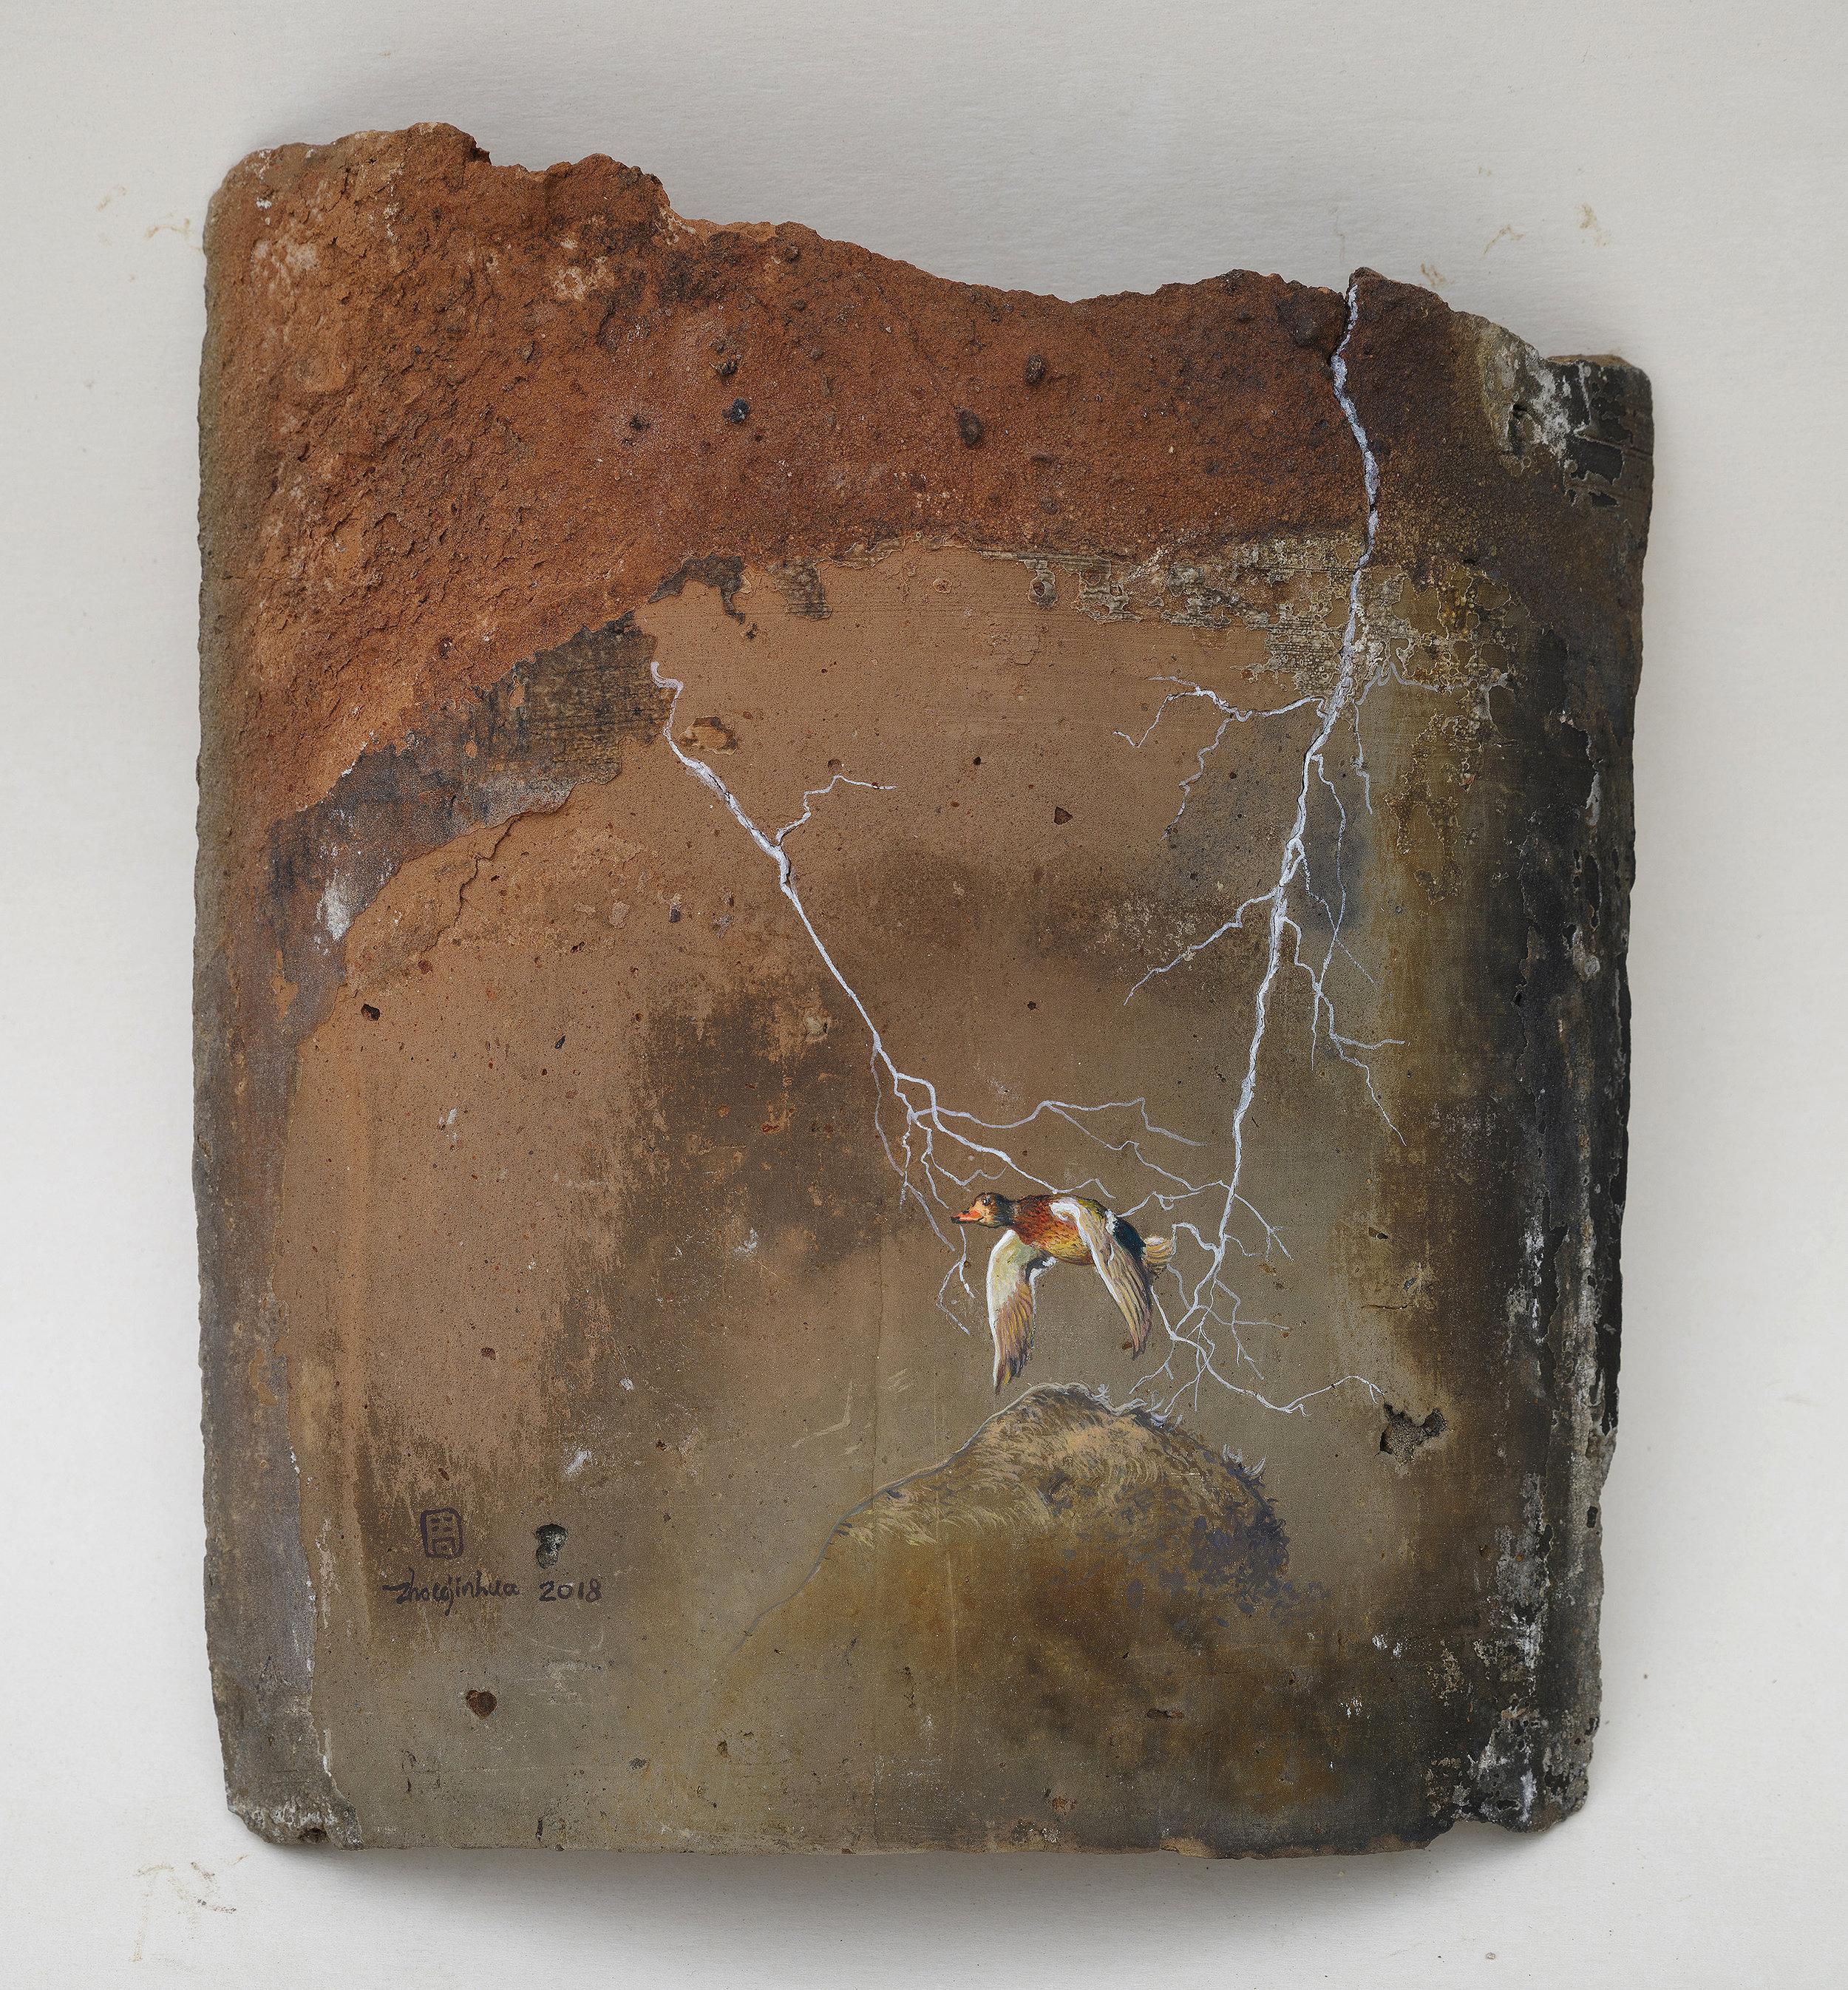 Zhou Jinhua 周金华, Remains of the Day 你我的痕迹 No.7, 2018, Acrylic on roof tile 瓦片、丙烯颜料, 21.5 x 18.5 cm